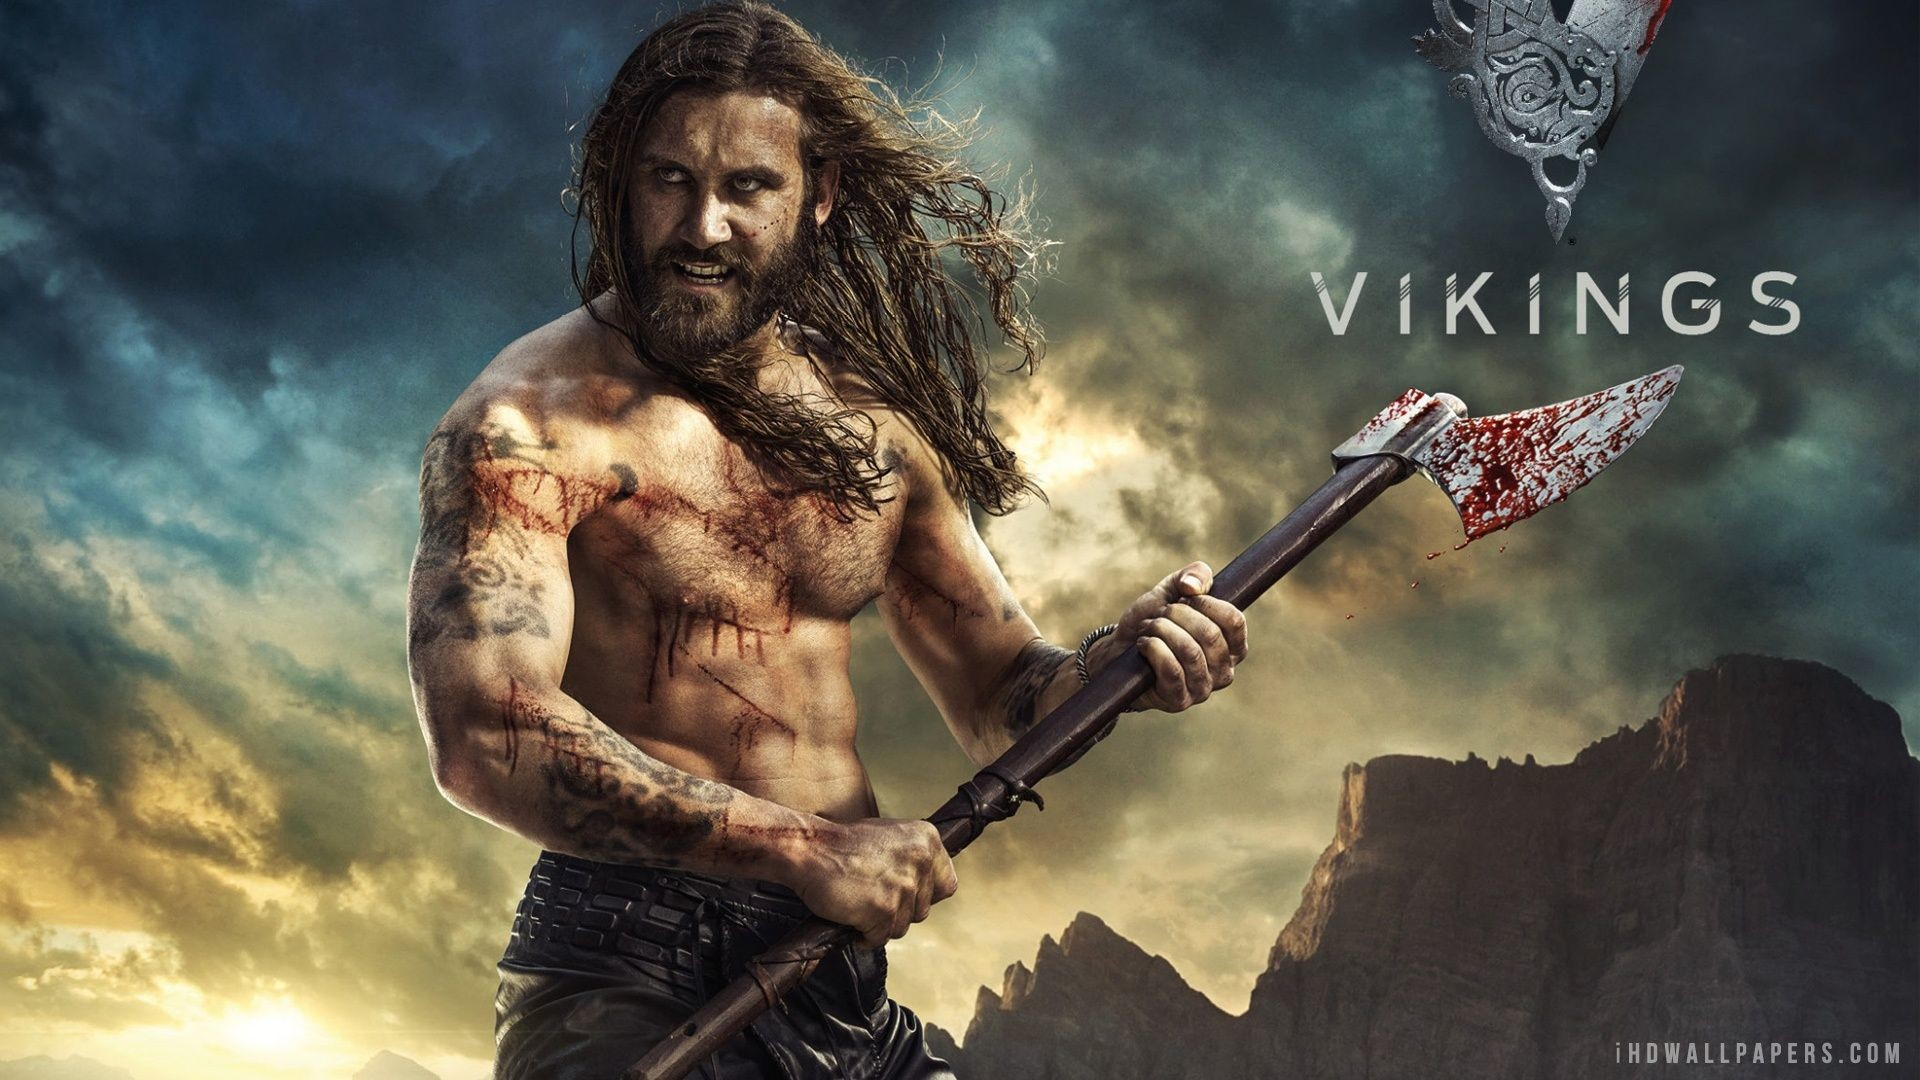 Rollo Vikings Season 2 TV Series 2014 HD Wallpaper – iHD Wallpapers